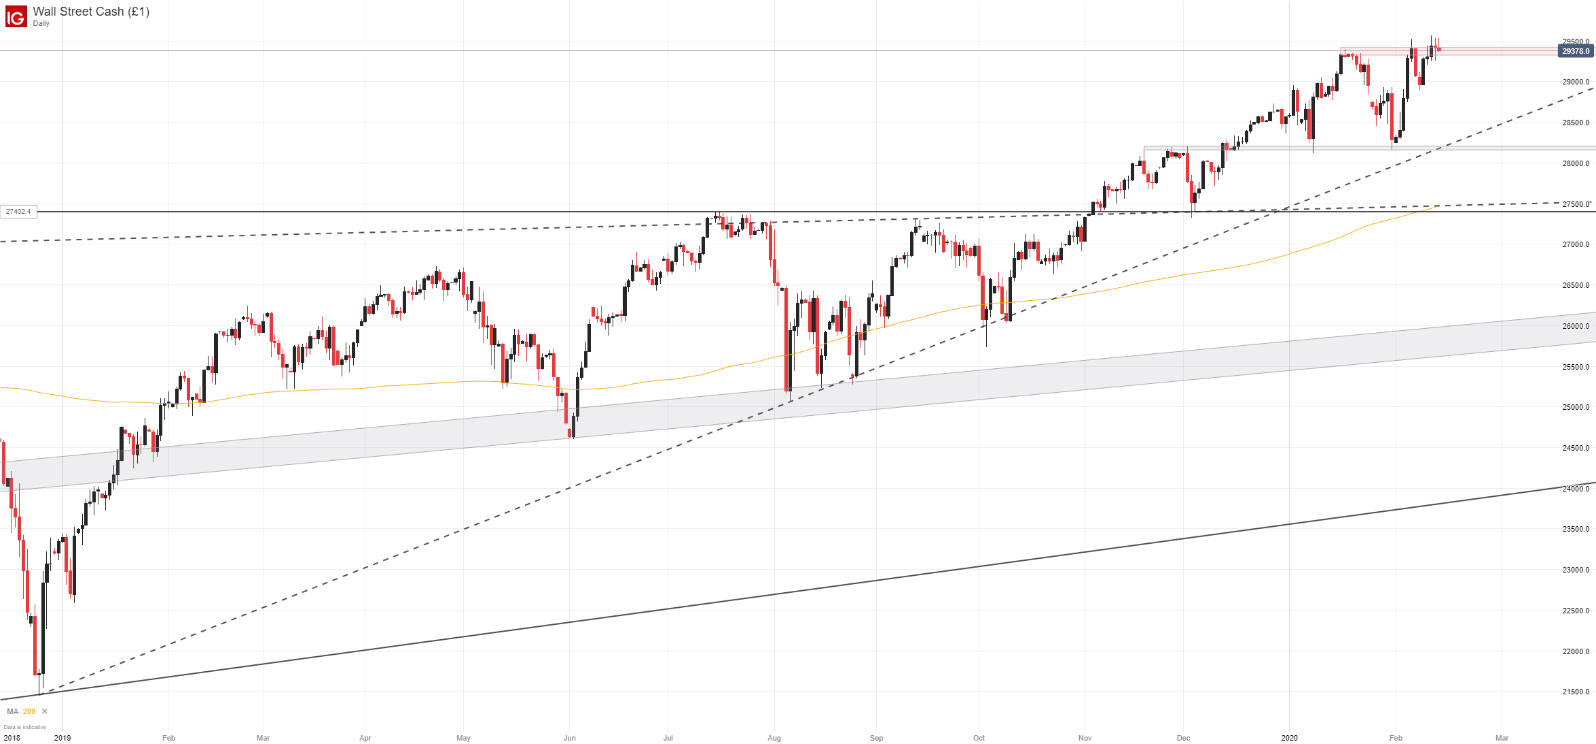 Dow Jones, Nasdaq 100, DAX 30 Forecasts for the Week Ahead